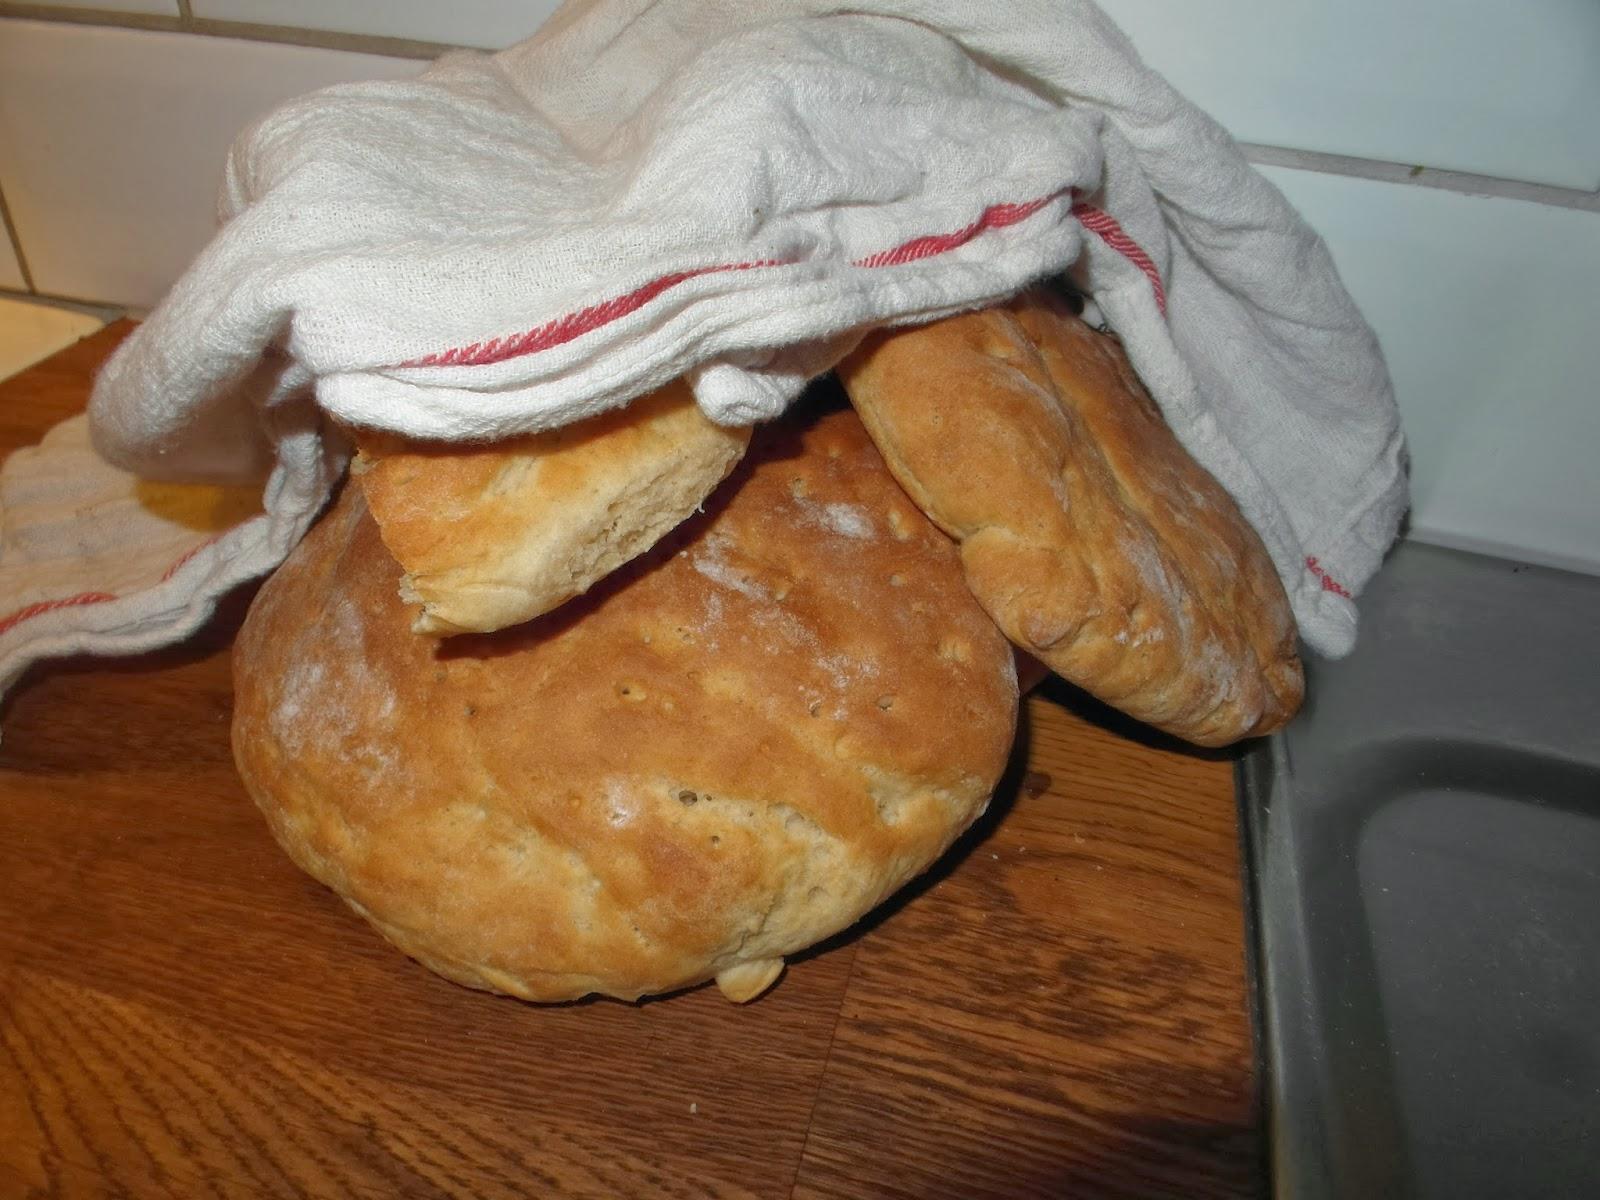 Rågsikt, bröd, laktosfri, laktosfrittbröd